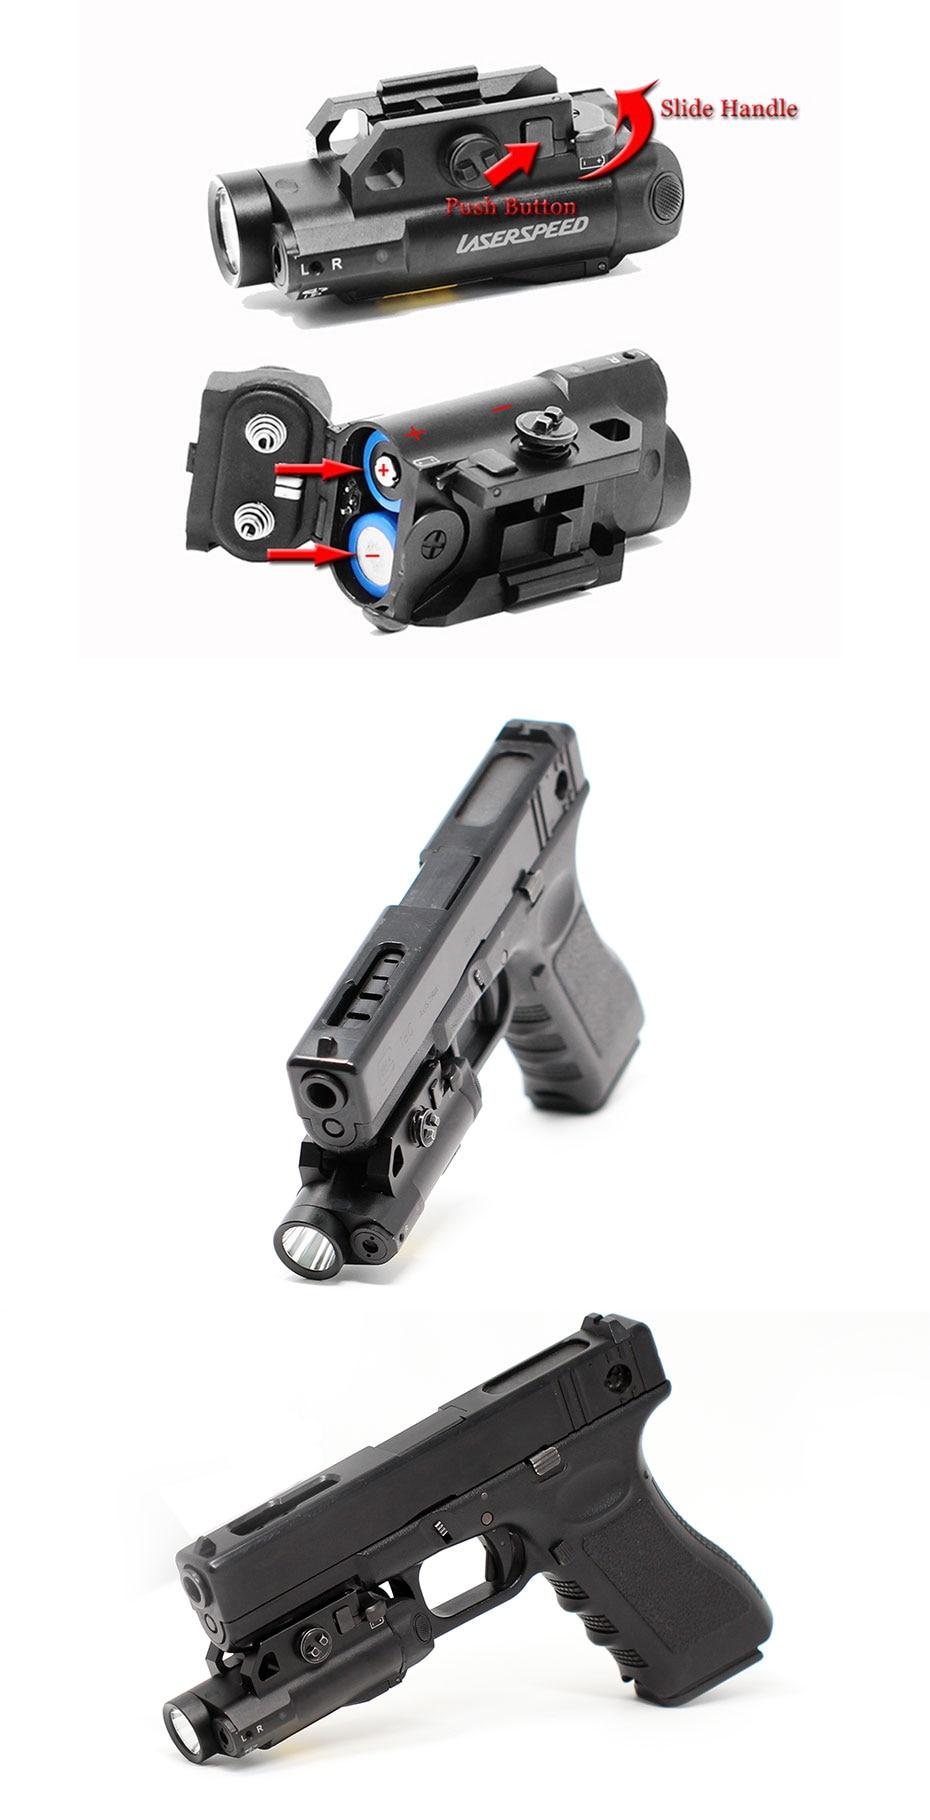 LS-CL7 compacto laser luz combinação pistola laser